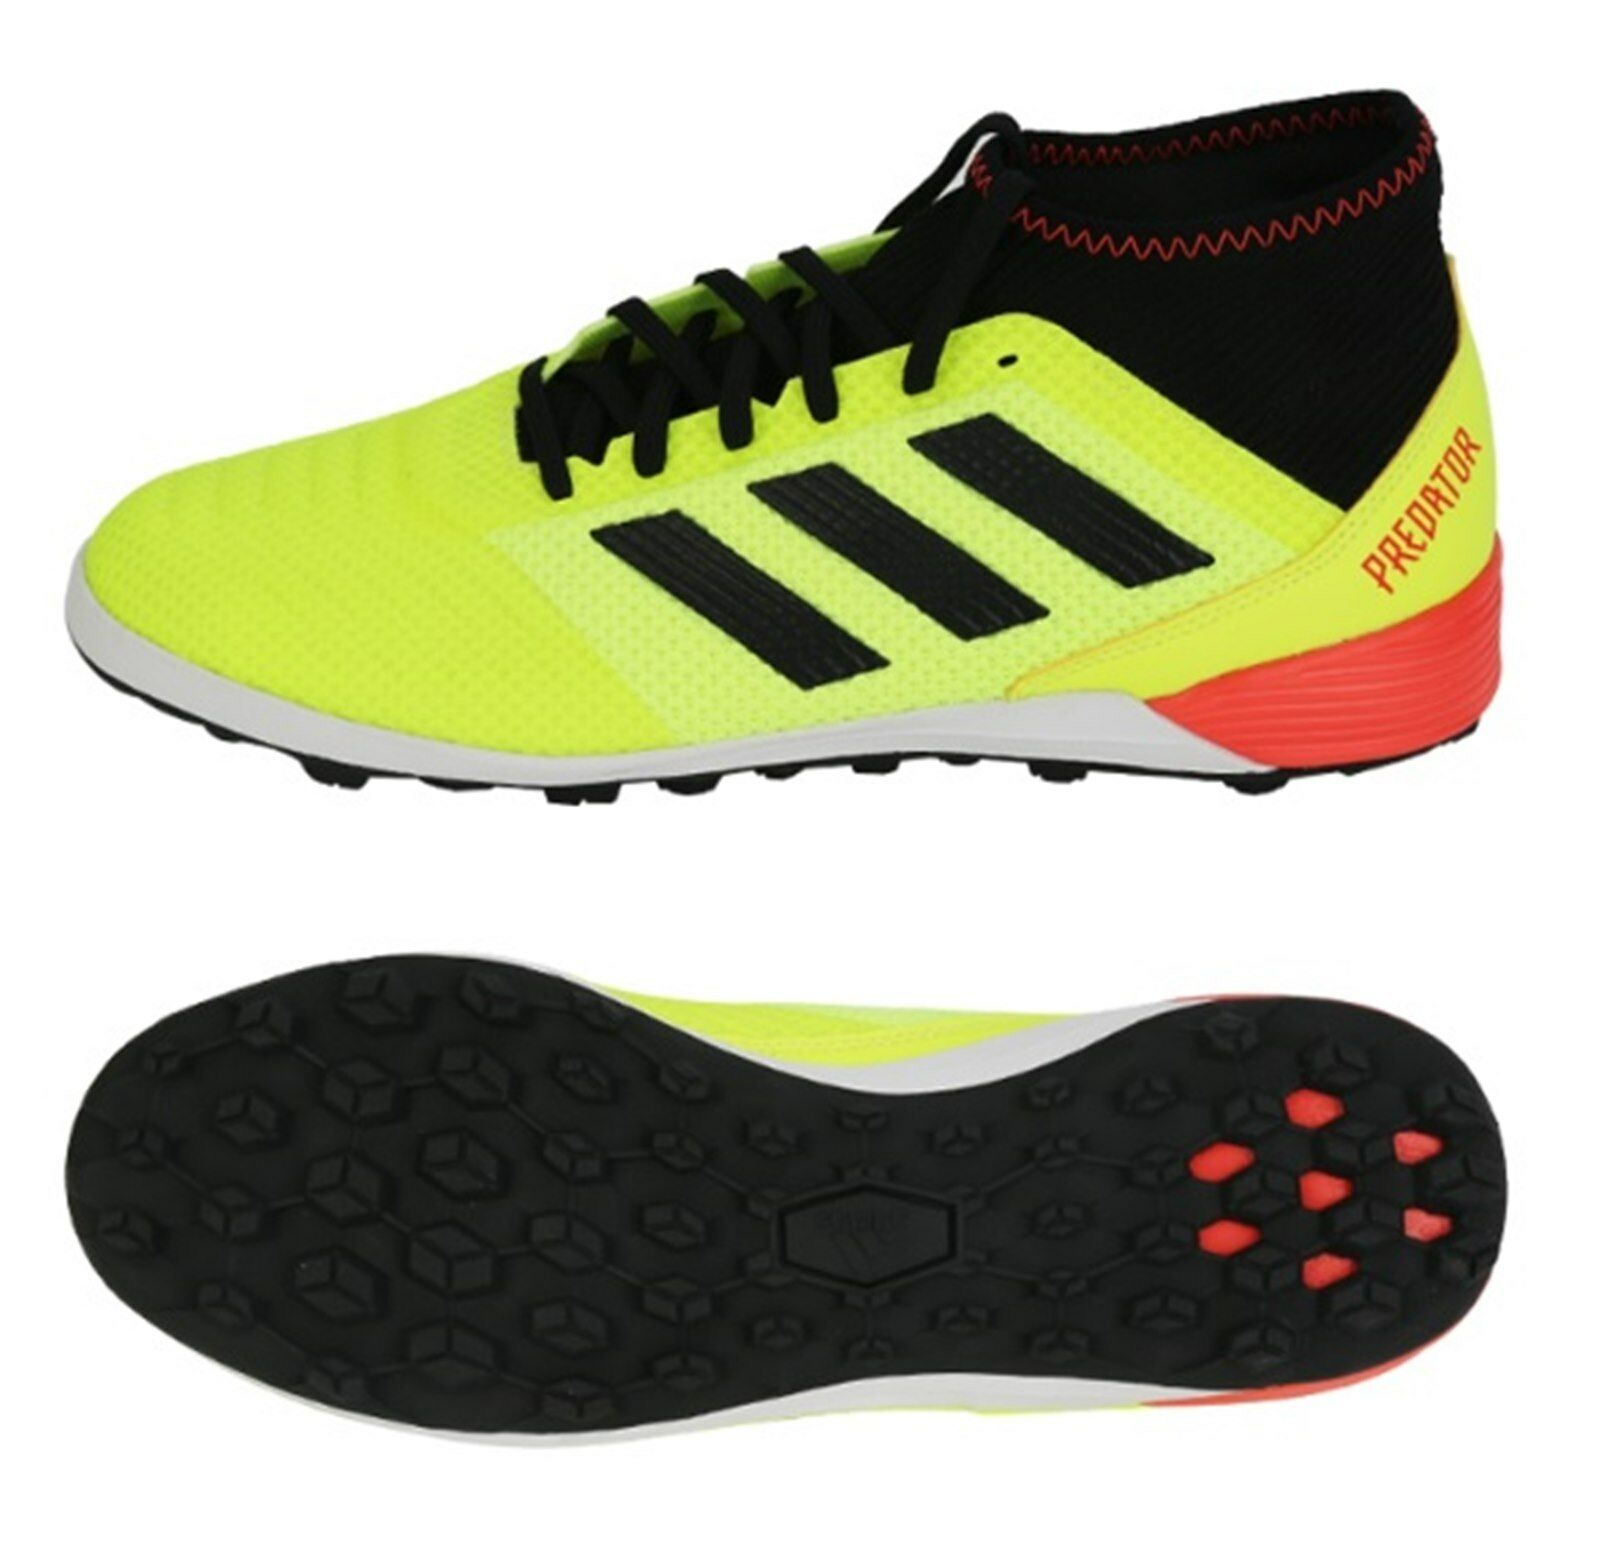 Adidas Men Predator Tango 18.3 TF Cleats Futsal Green shoes Boot Spike DB2134